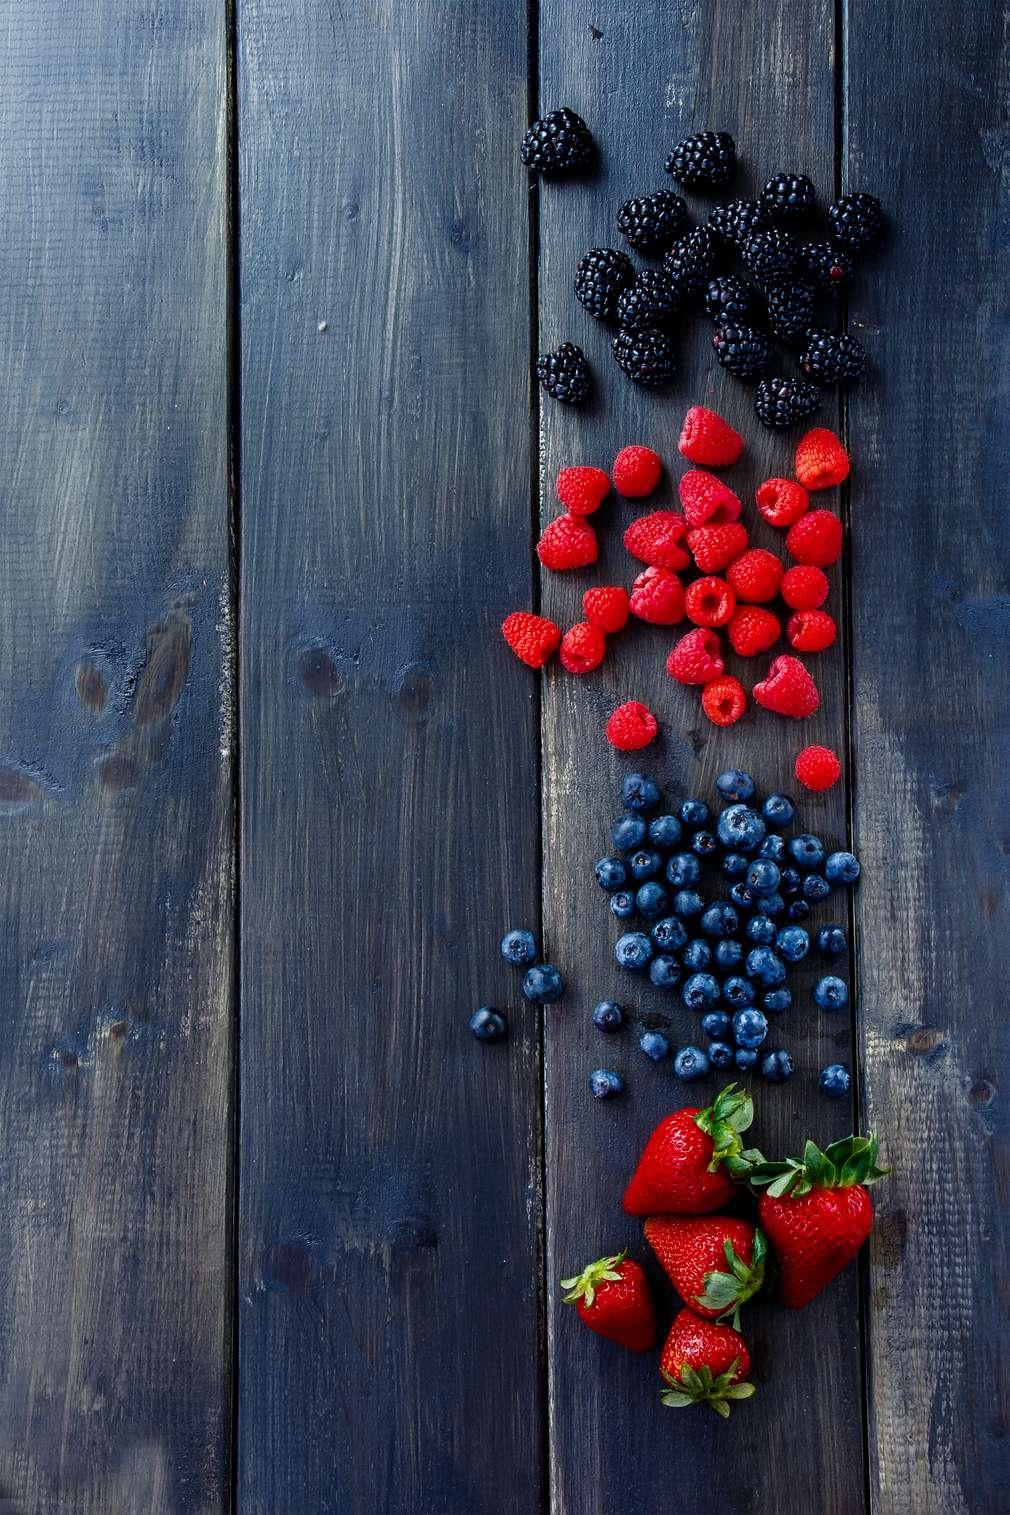 So gesund sind verschiedene Beerensorten